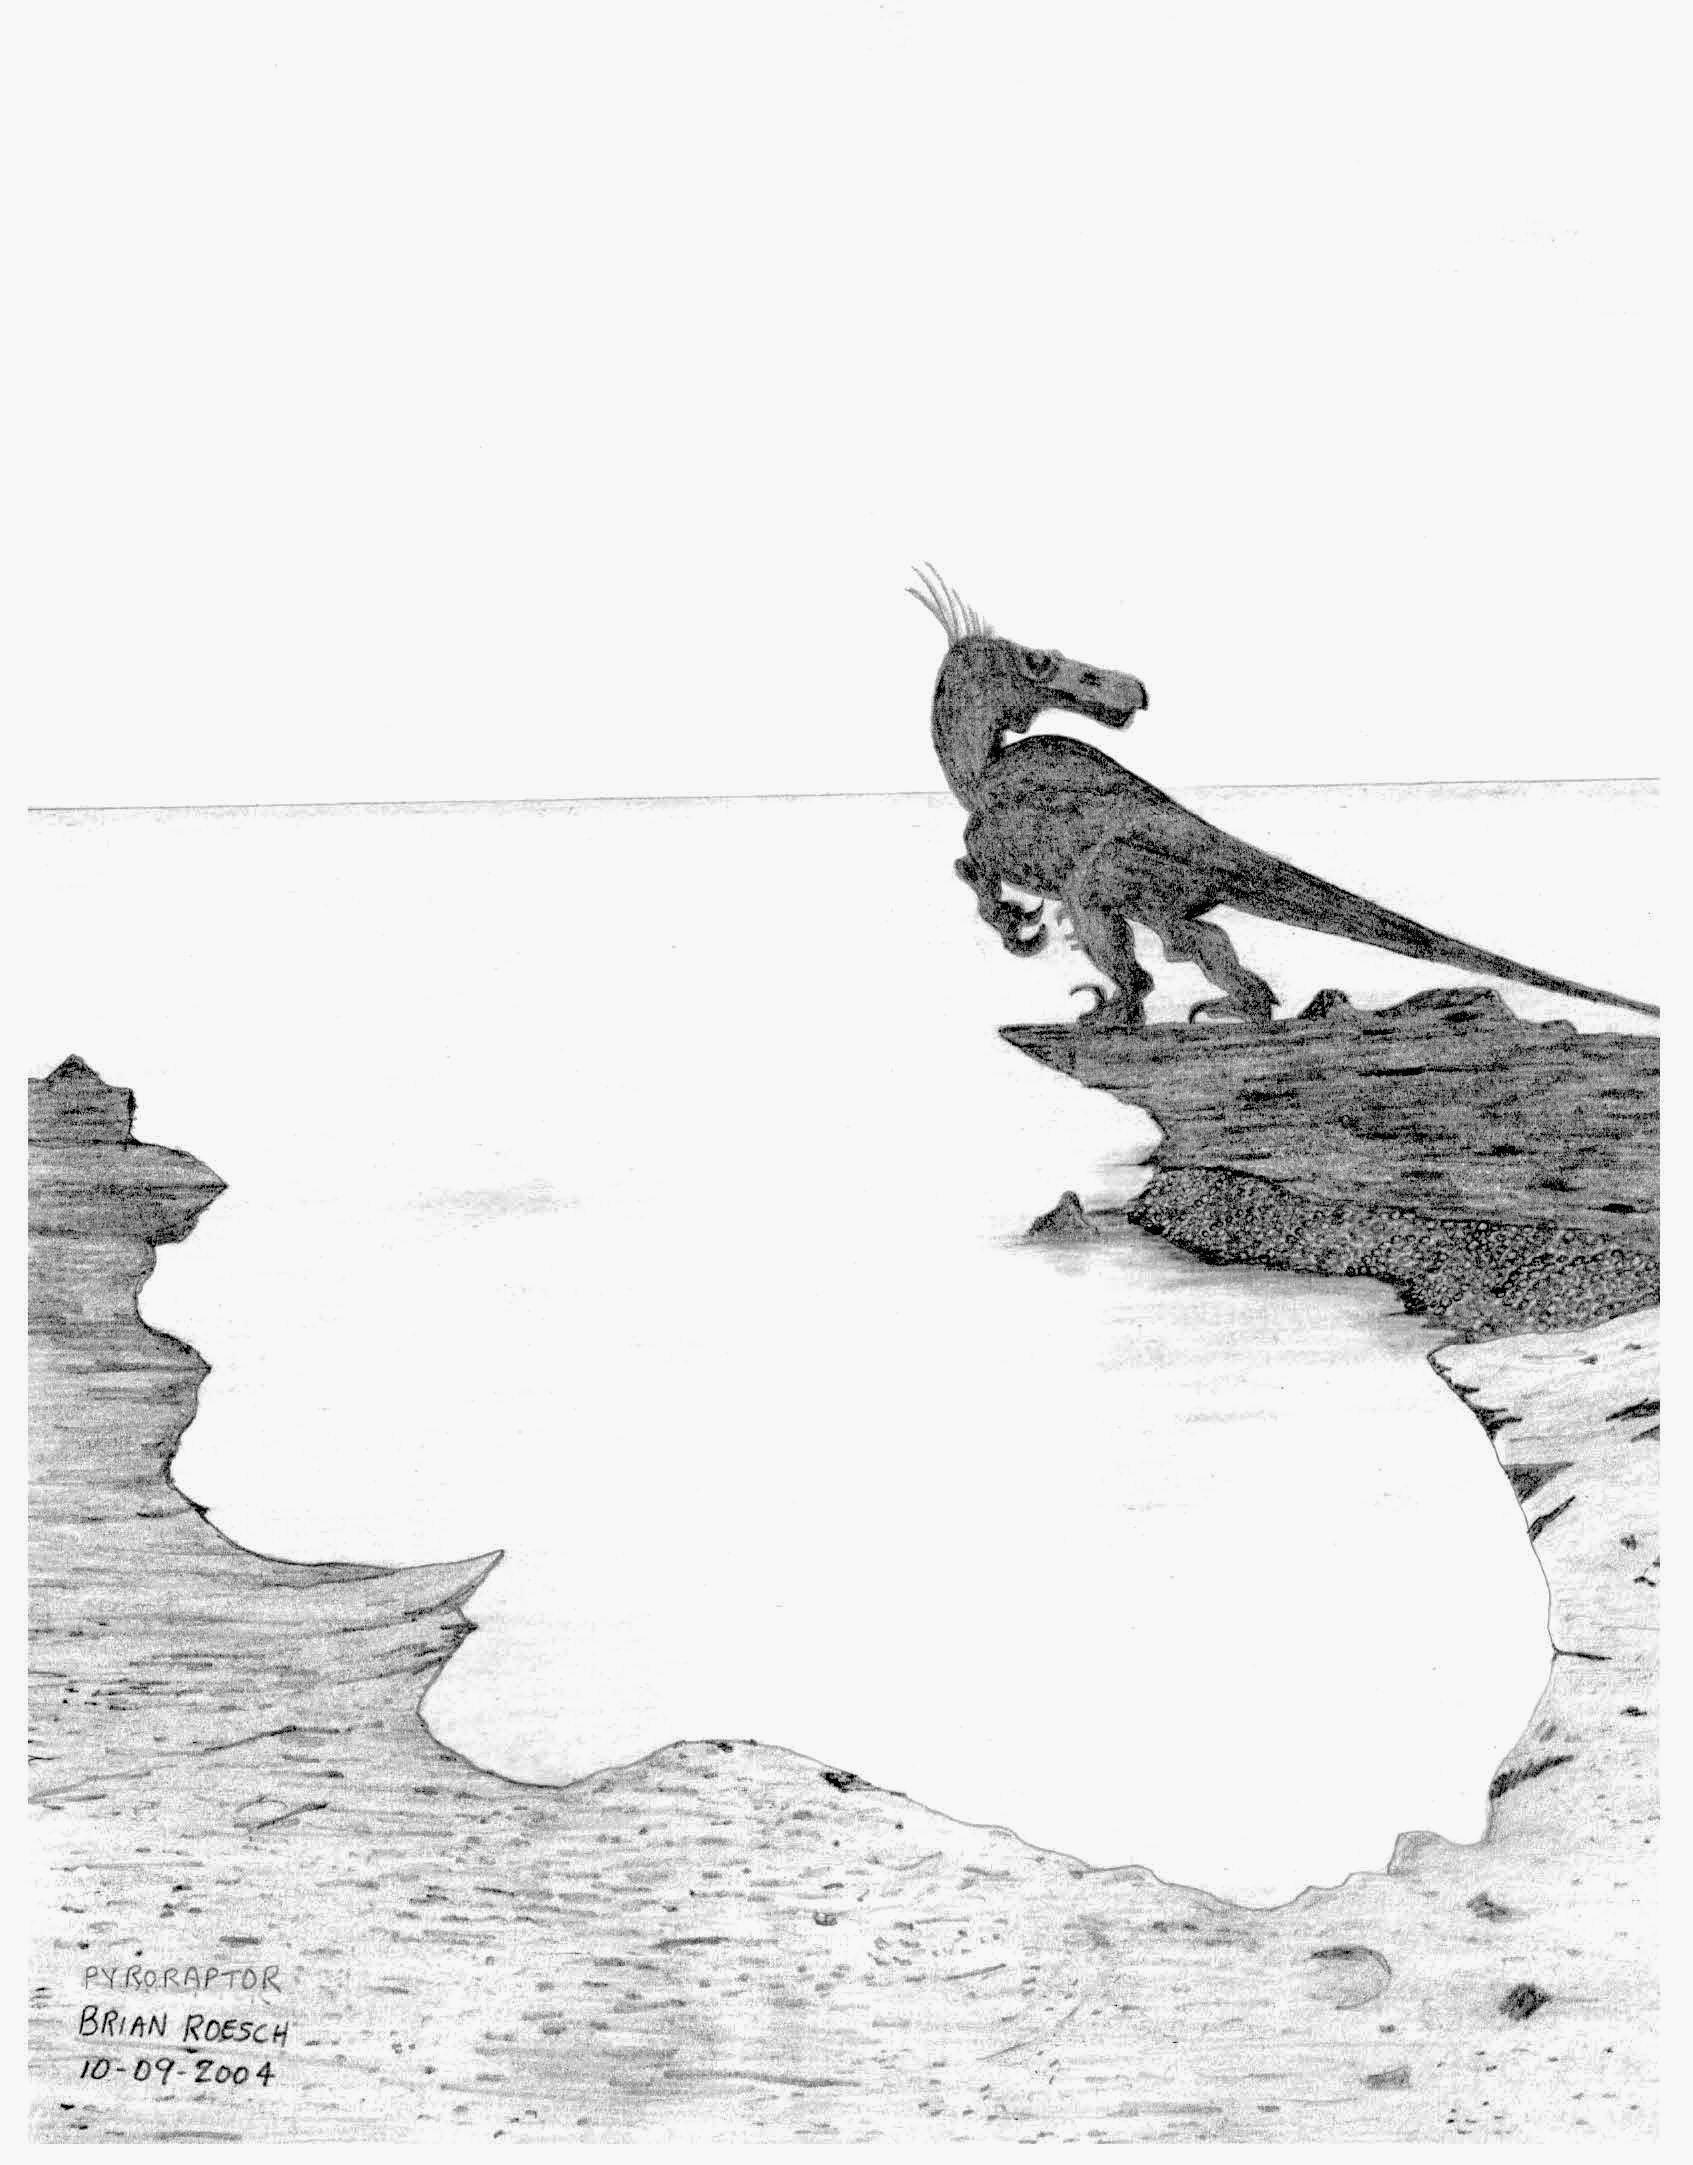 Pyroraptor at sea by briankroesch